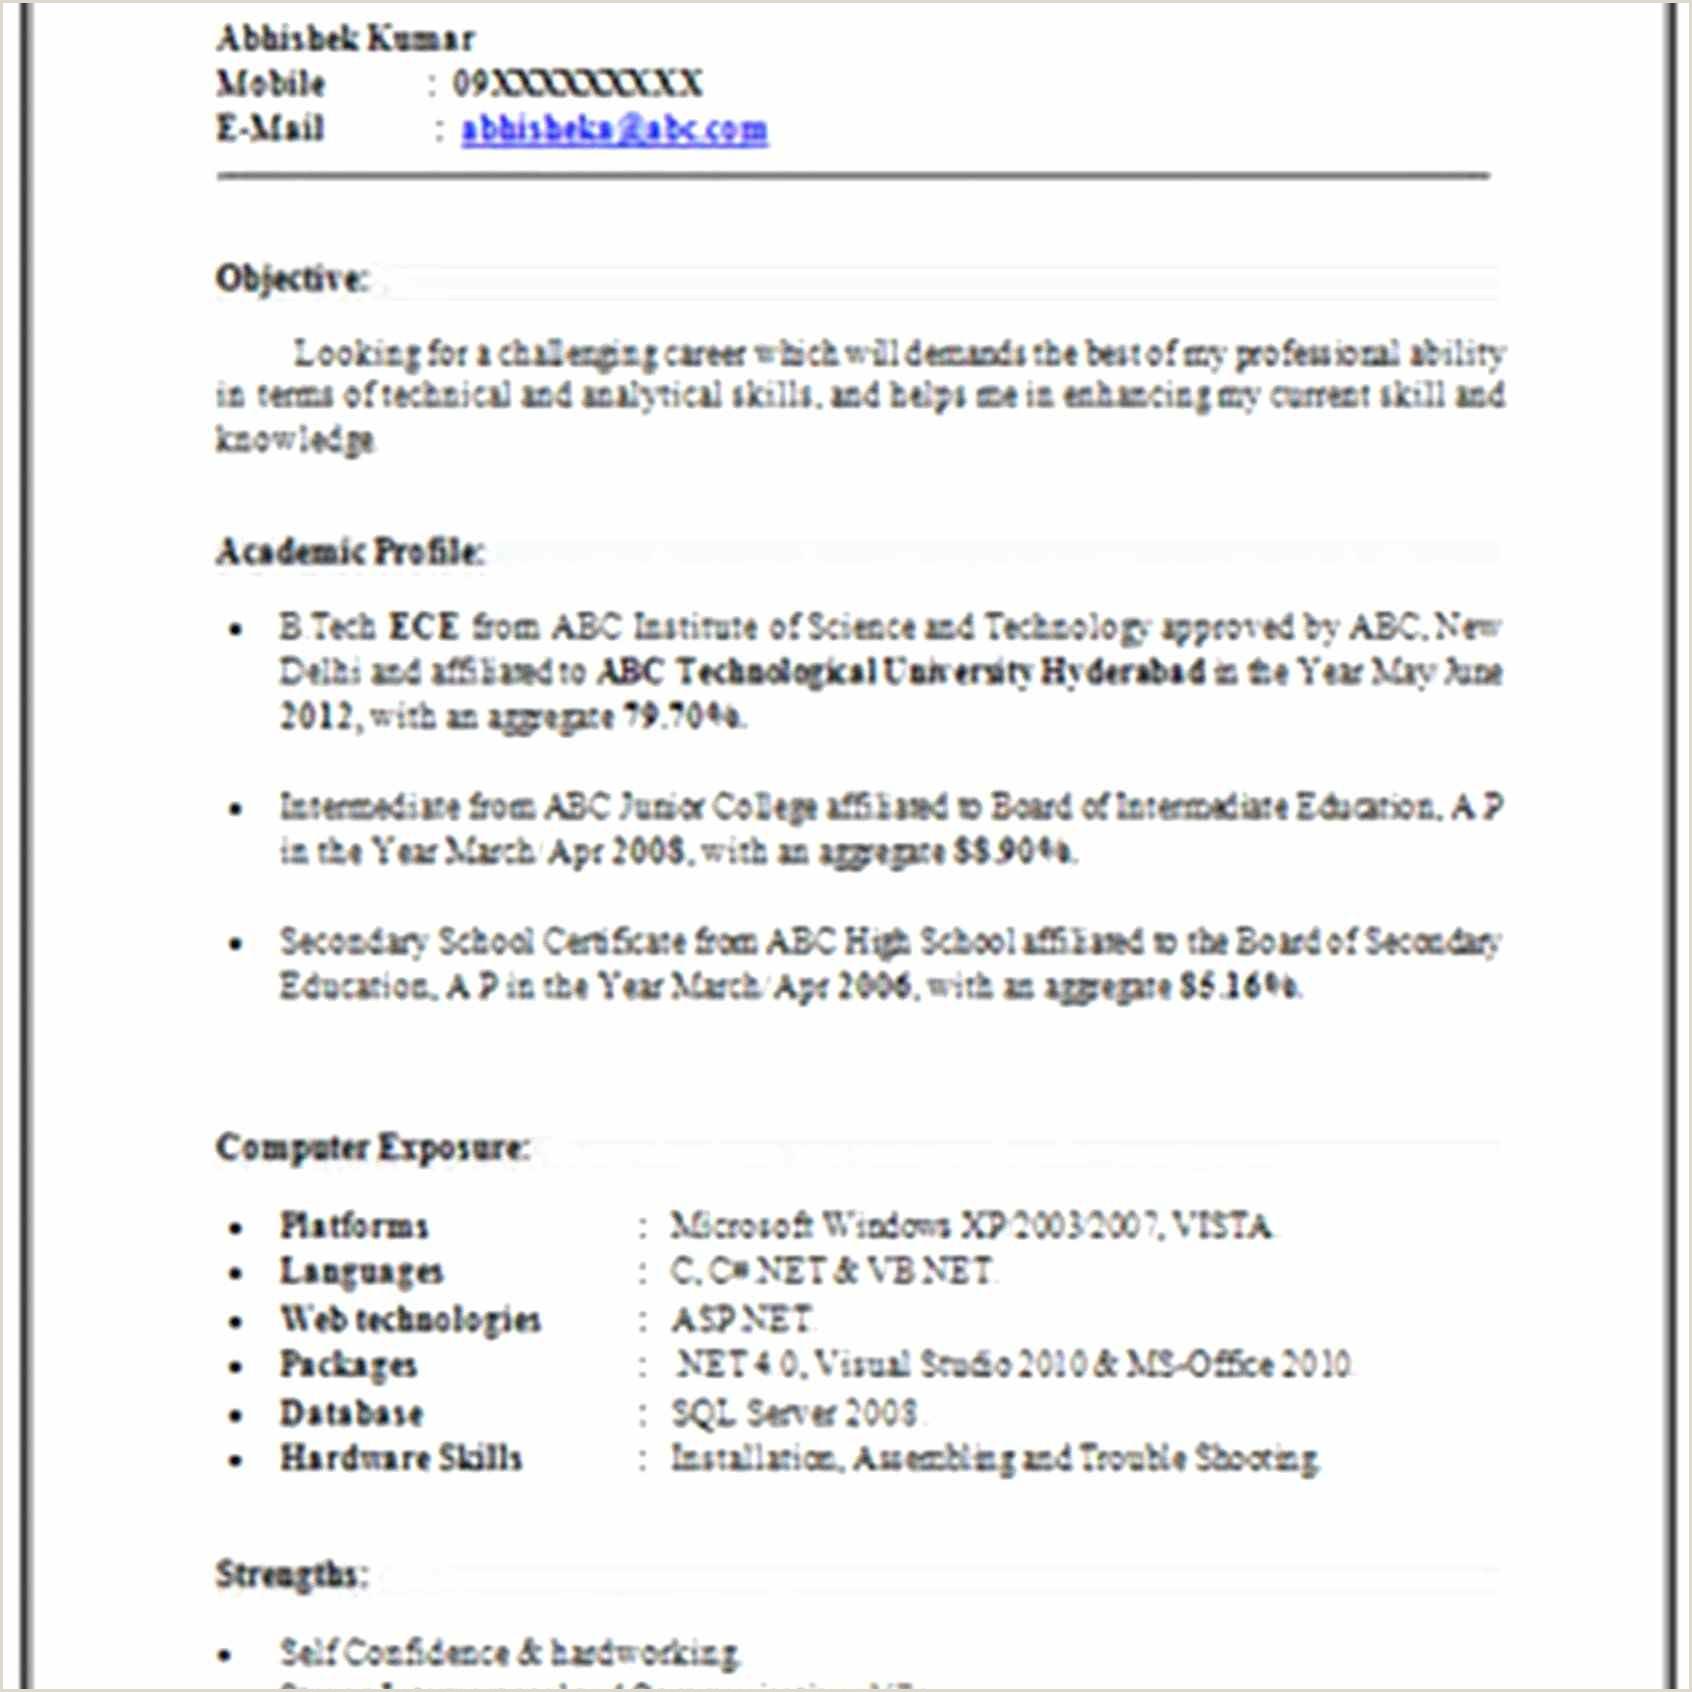 Fresher Resume Format For Ece Elegant Sample Resume For Freshers Mba Finance And Marketing